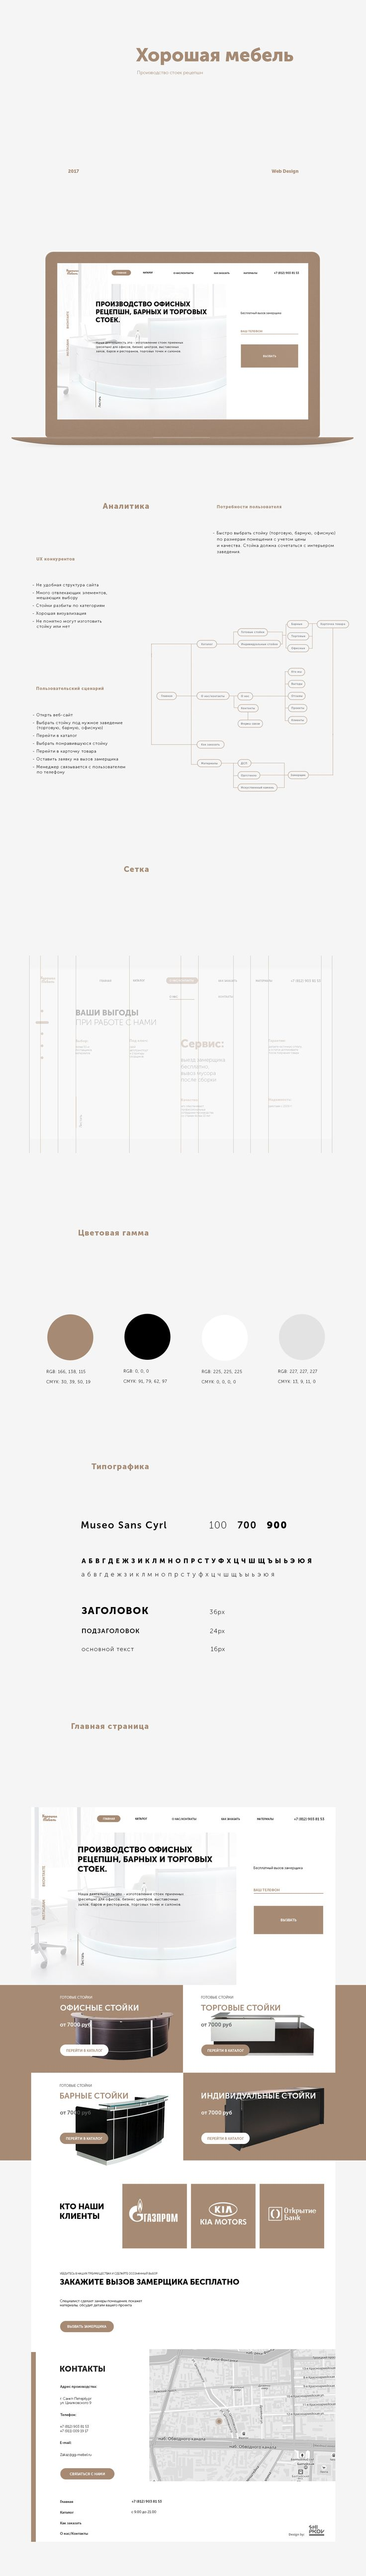 Redesign Good furniture on Behance